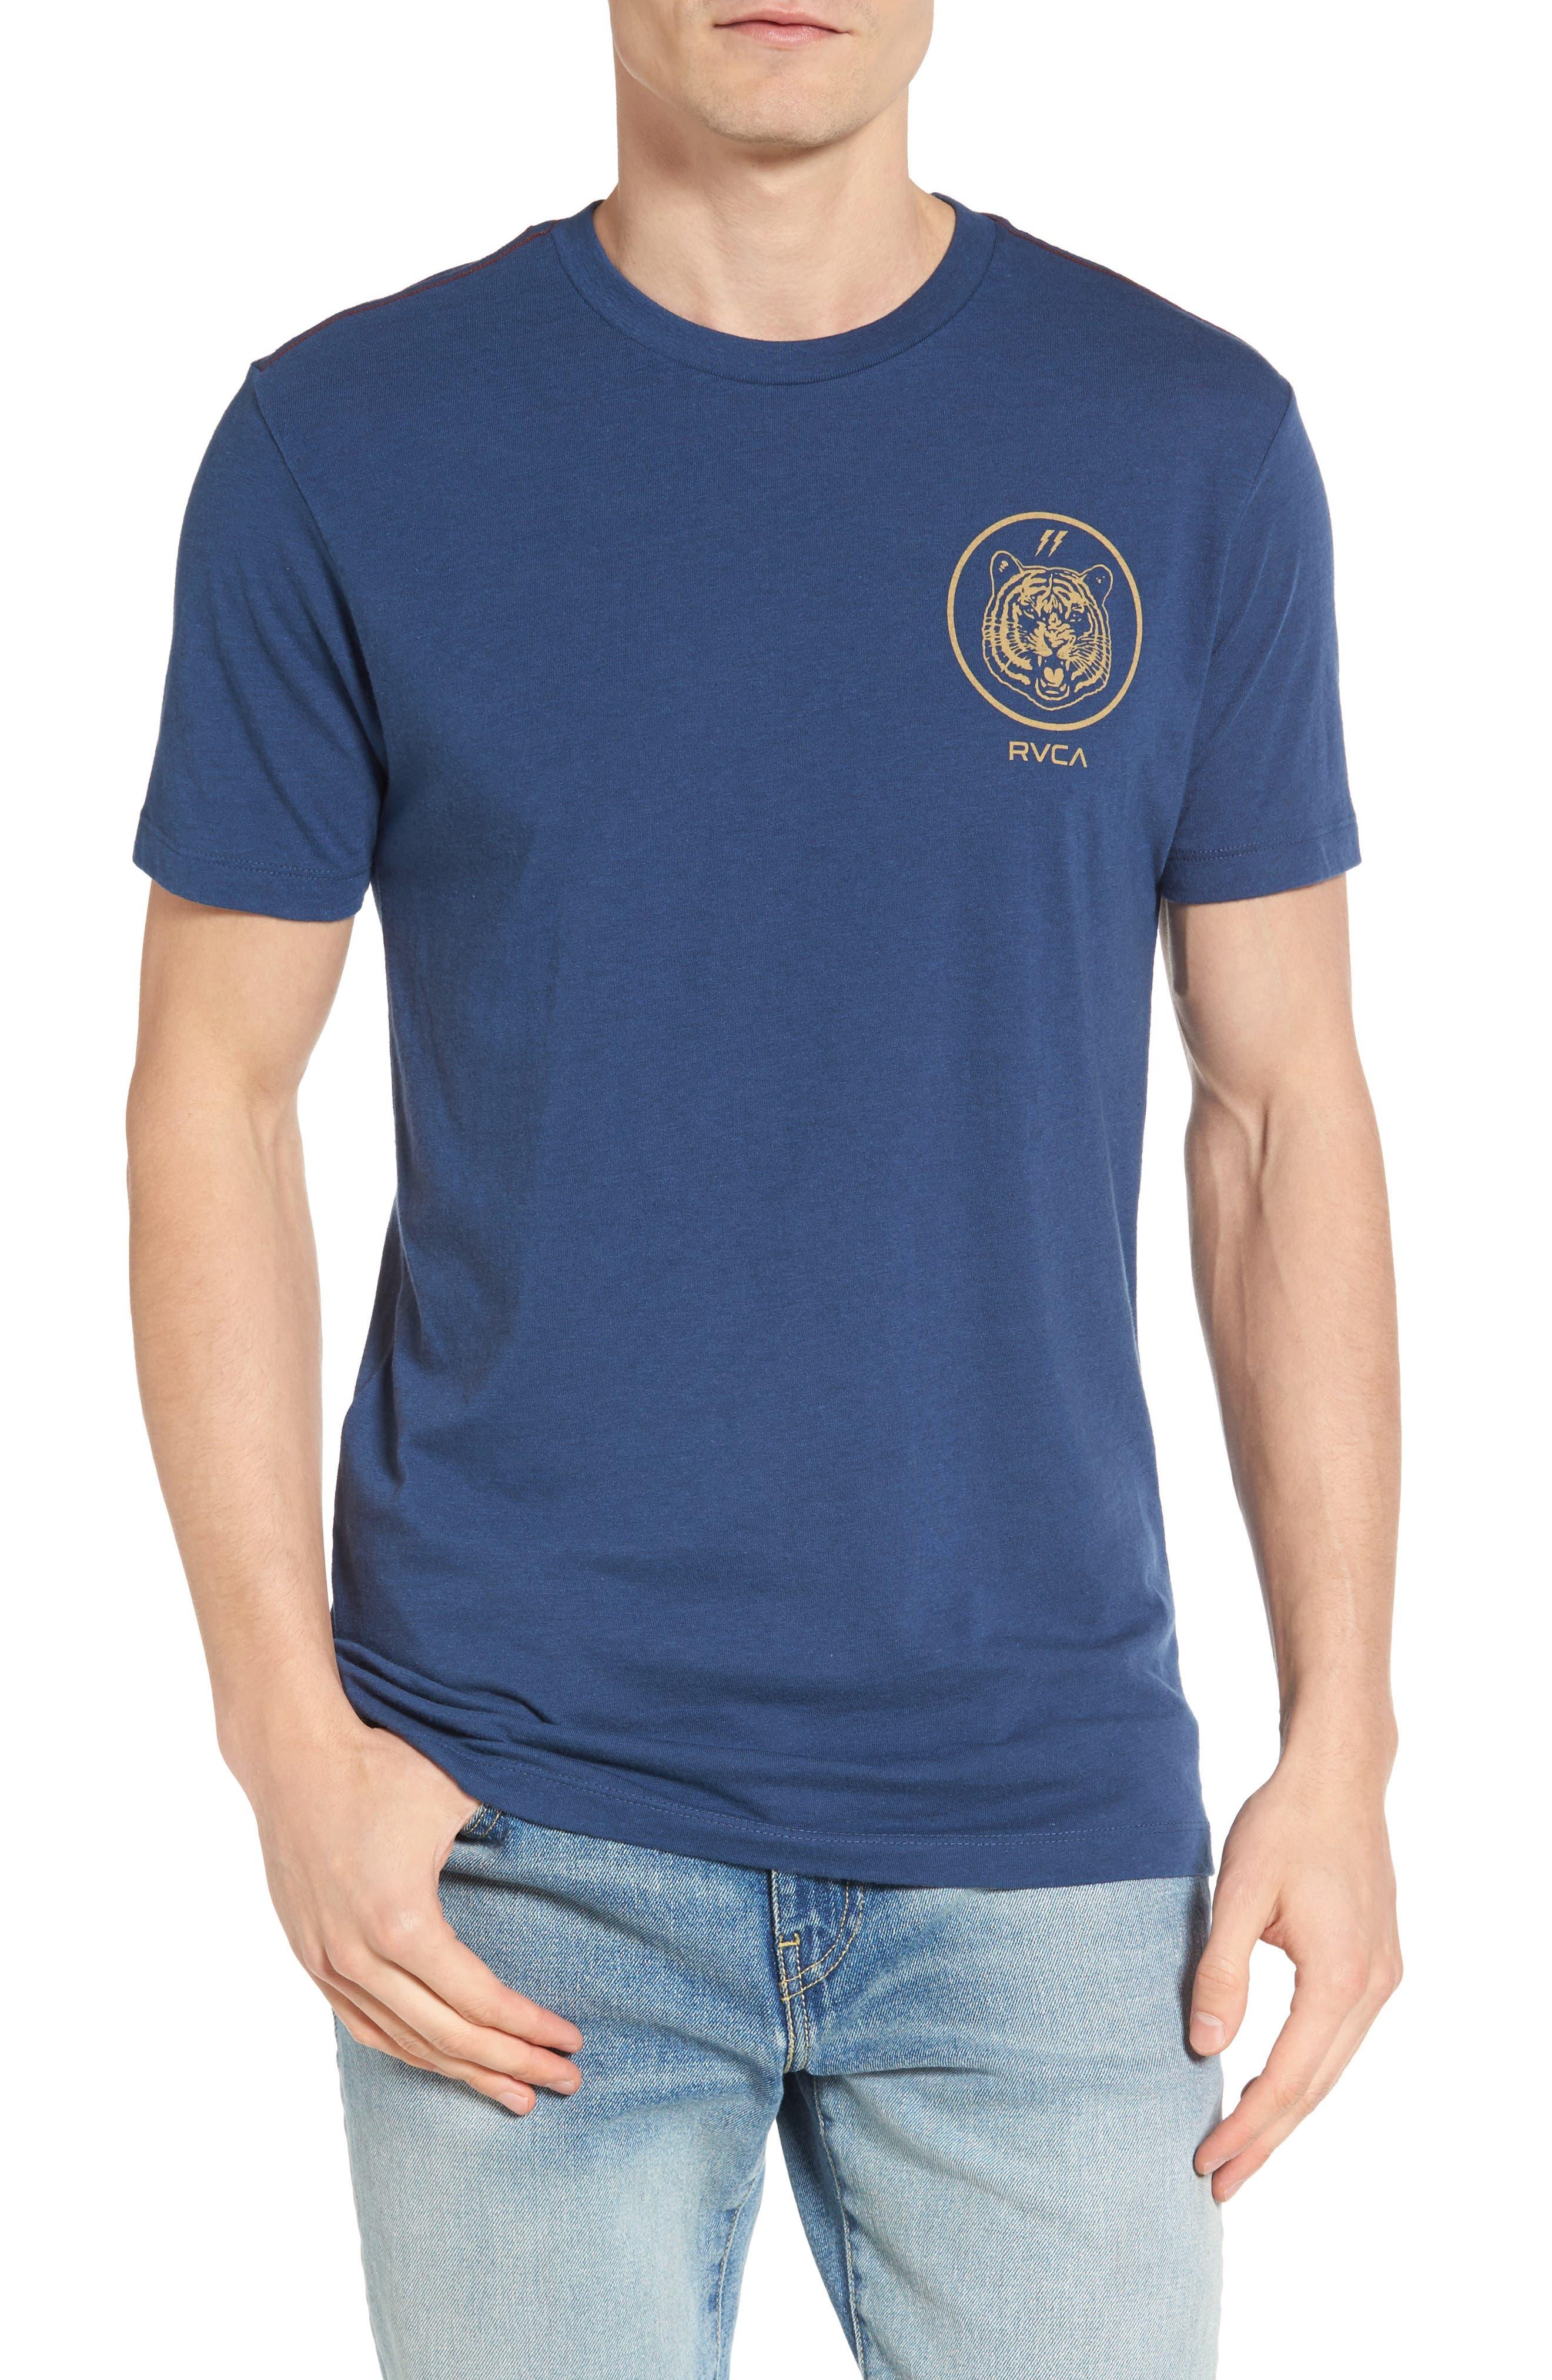 RVCA Prigus Sport Tiger Logo T-Shirt